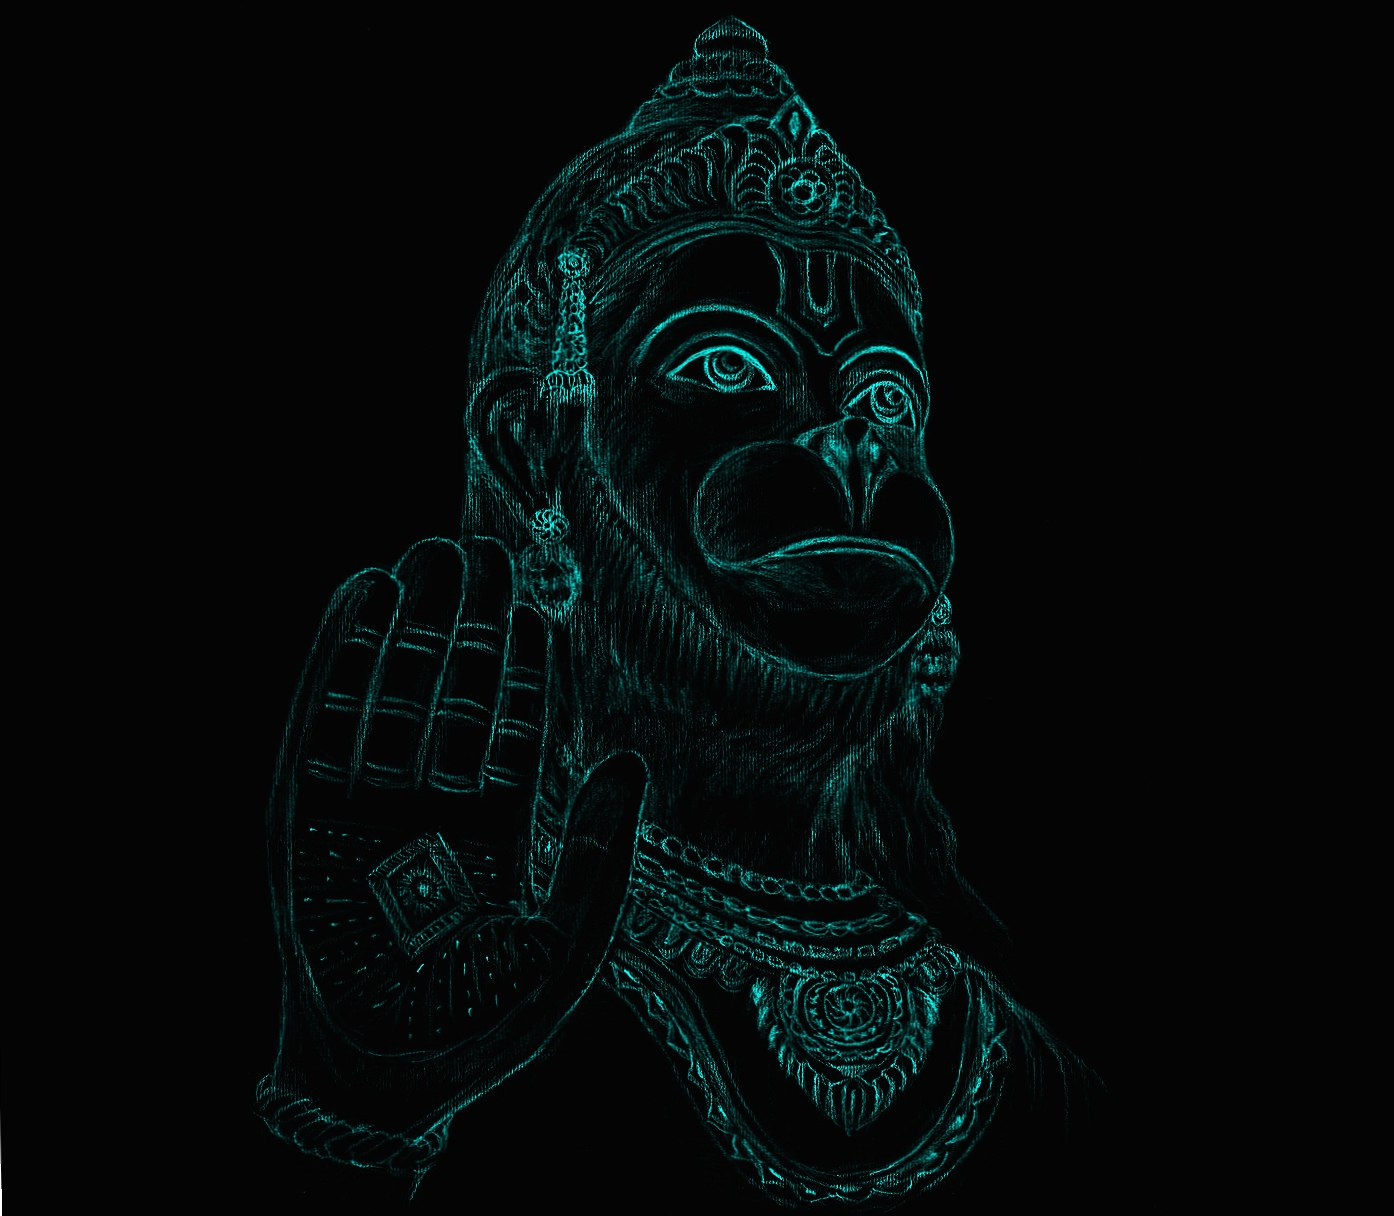 Neon Hanuman wallpapers HD quality